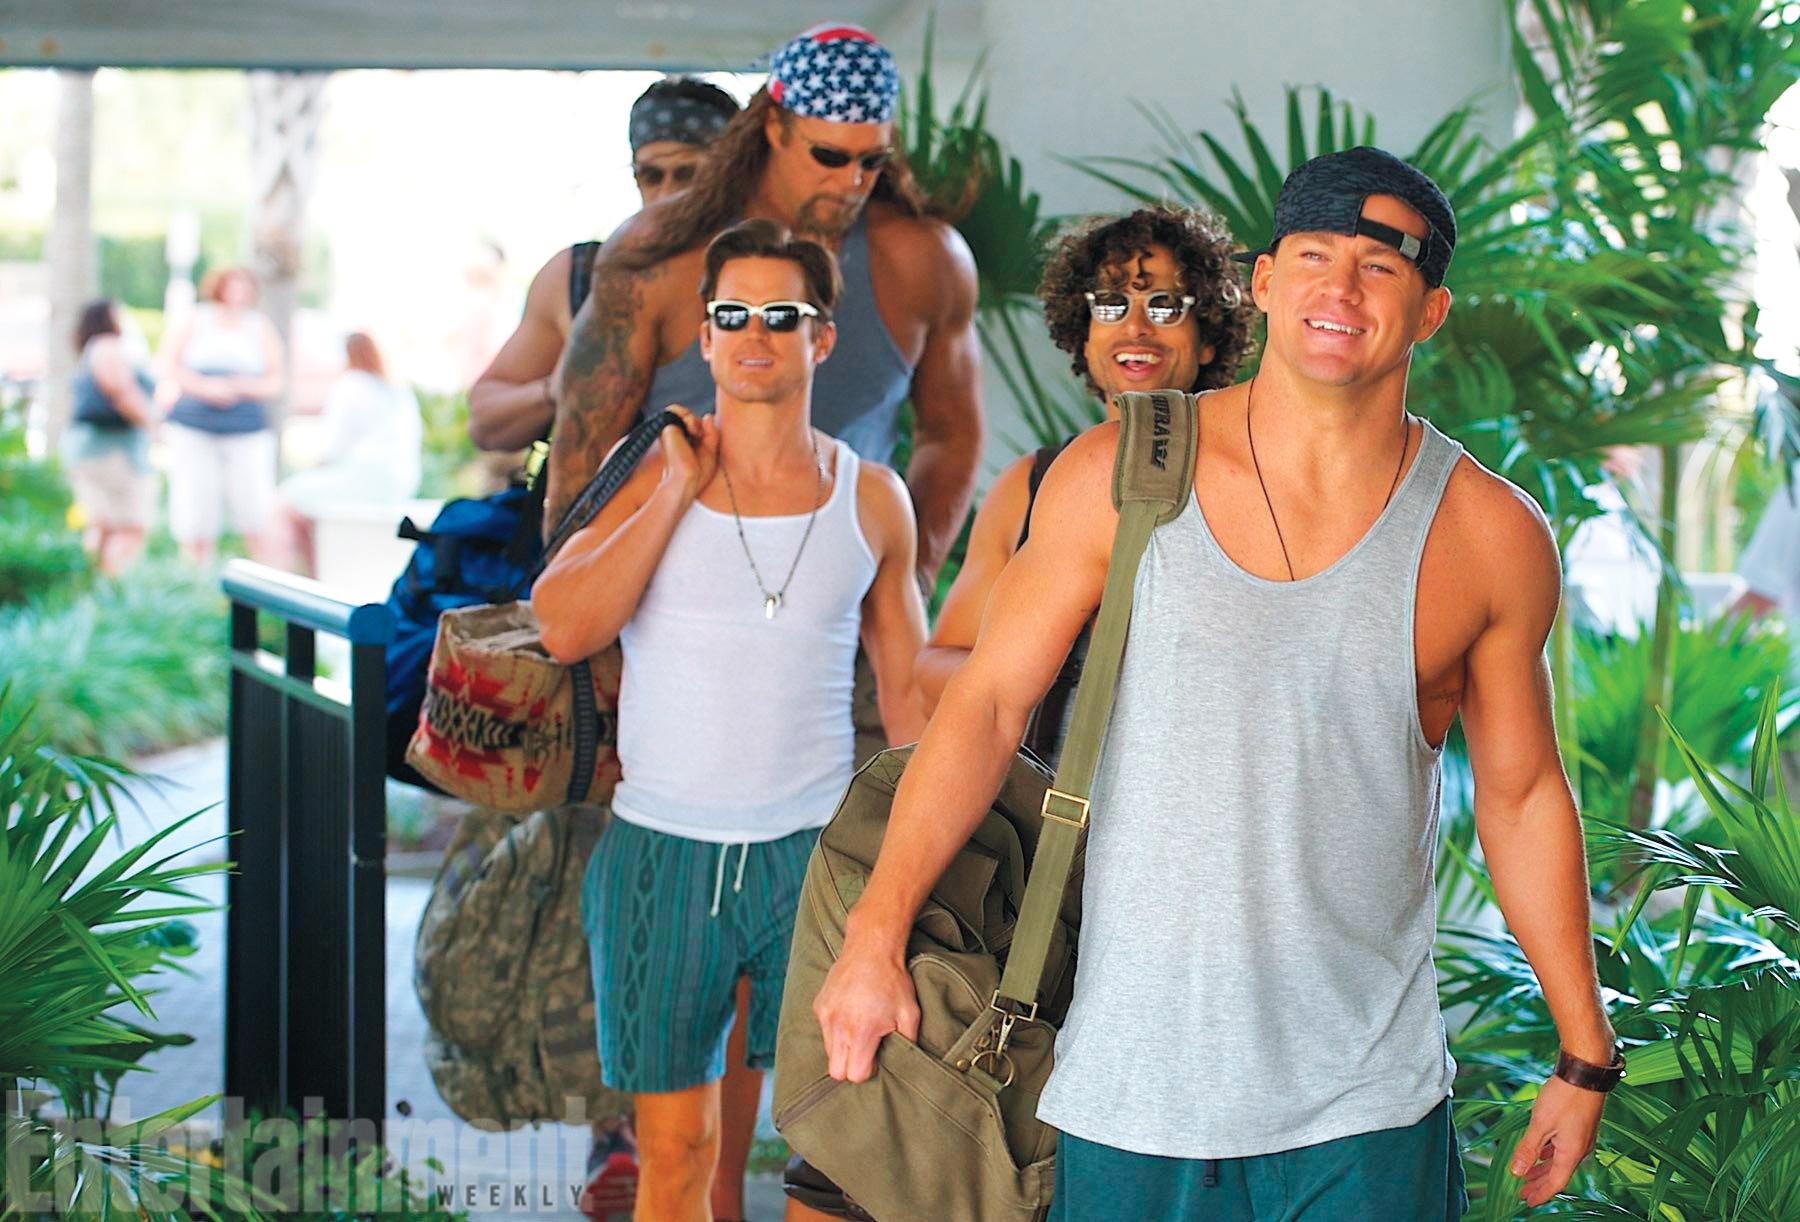 Channing Tatum, Adam Rodriguez, Matt Bomer, Kevin Nash, and Joe Manganiello in Magic Mike XXL